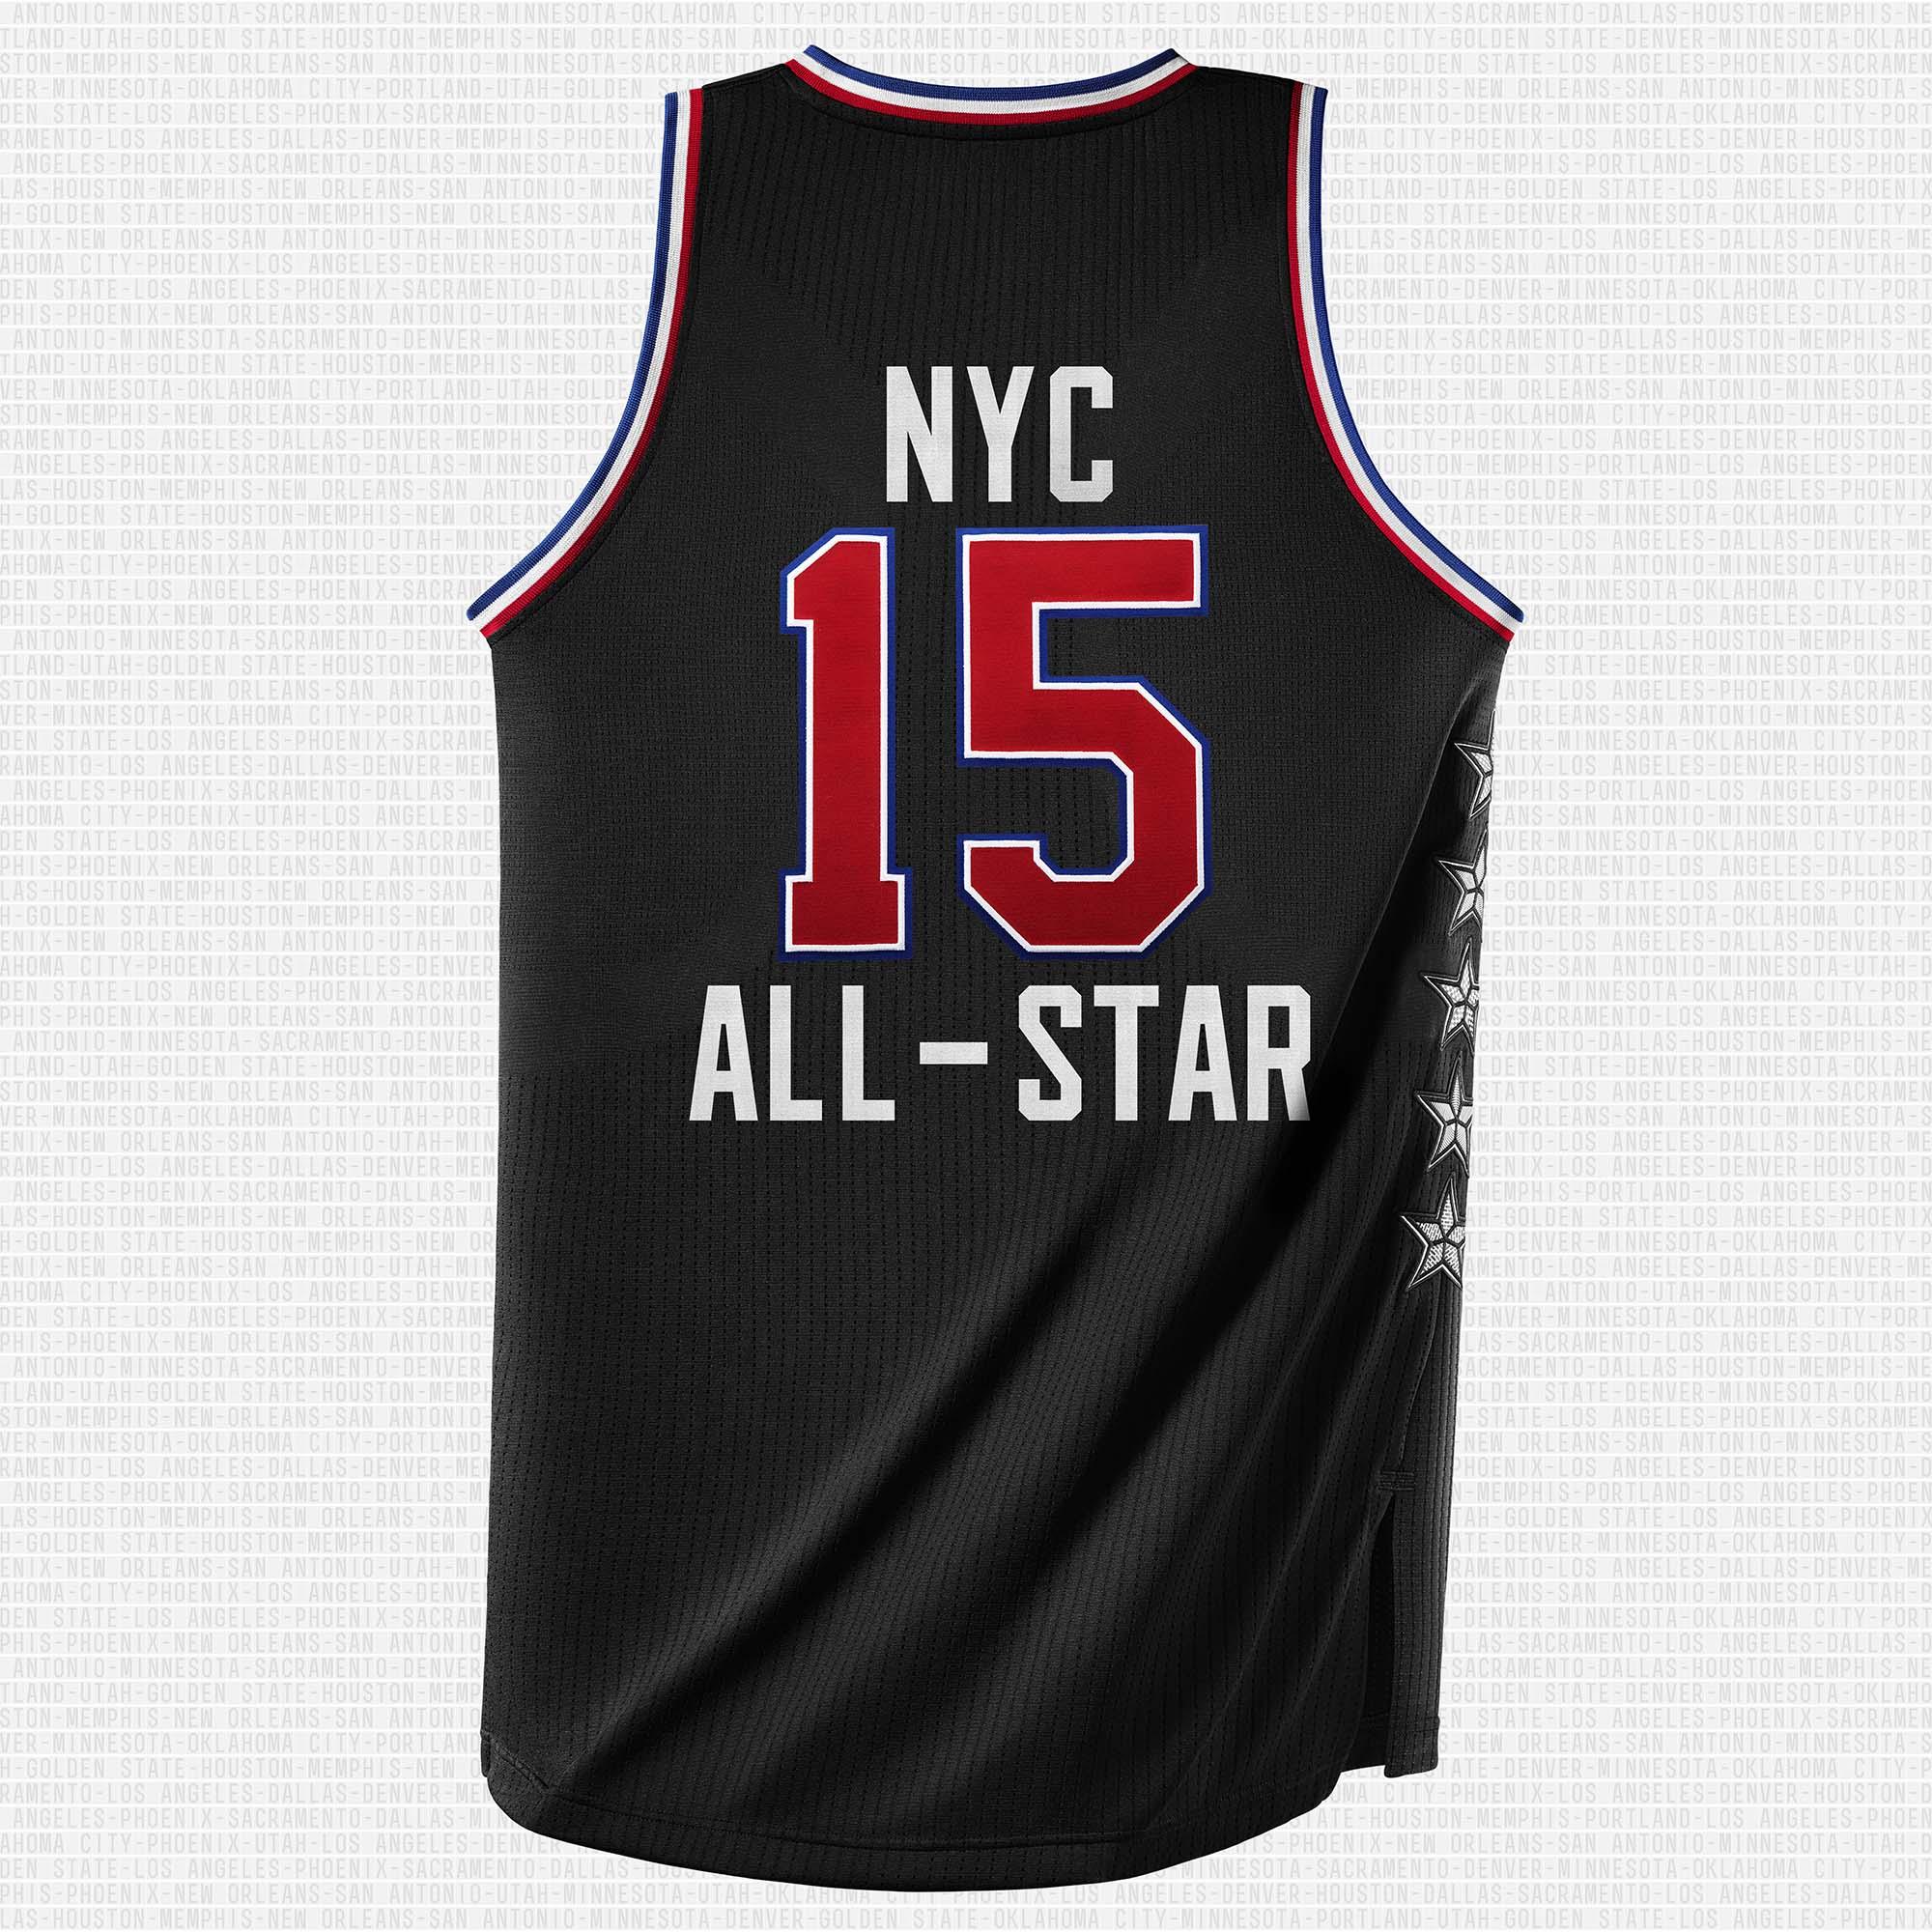 2015 NBA All-Star Jersey S